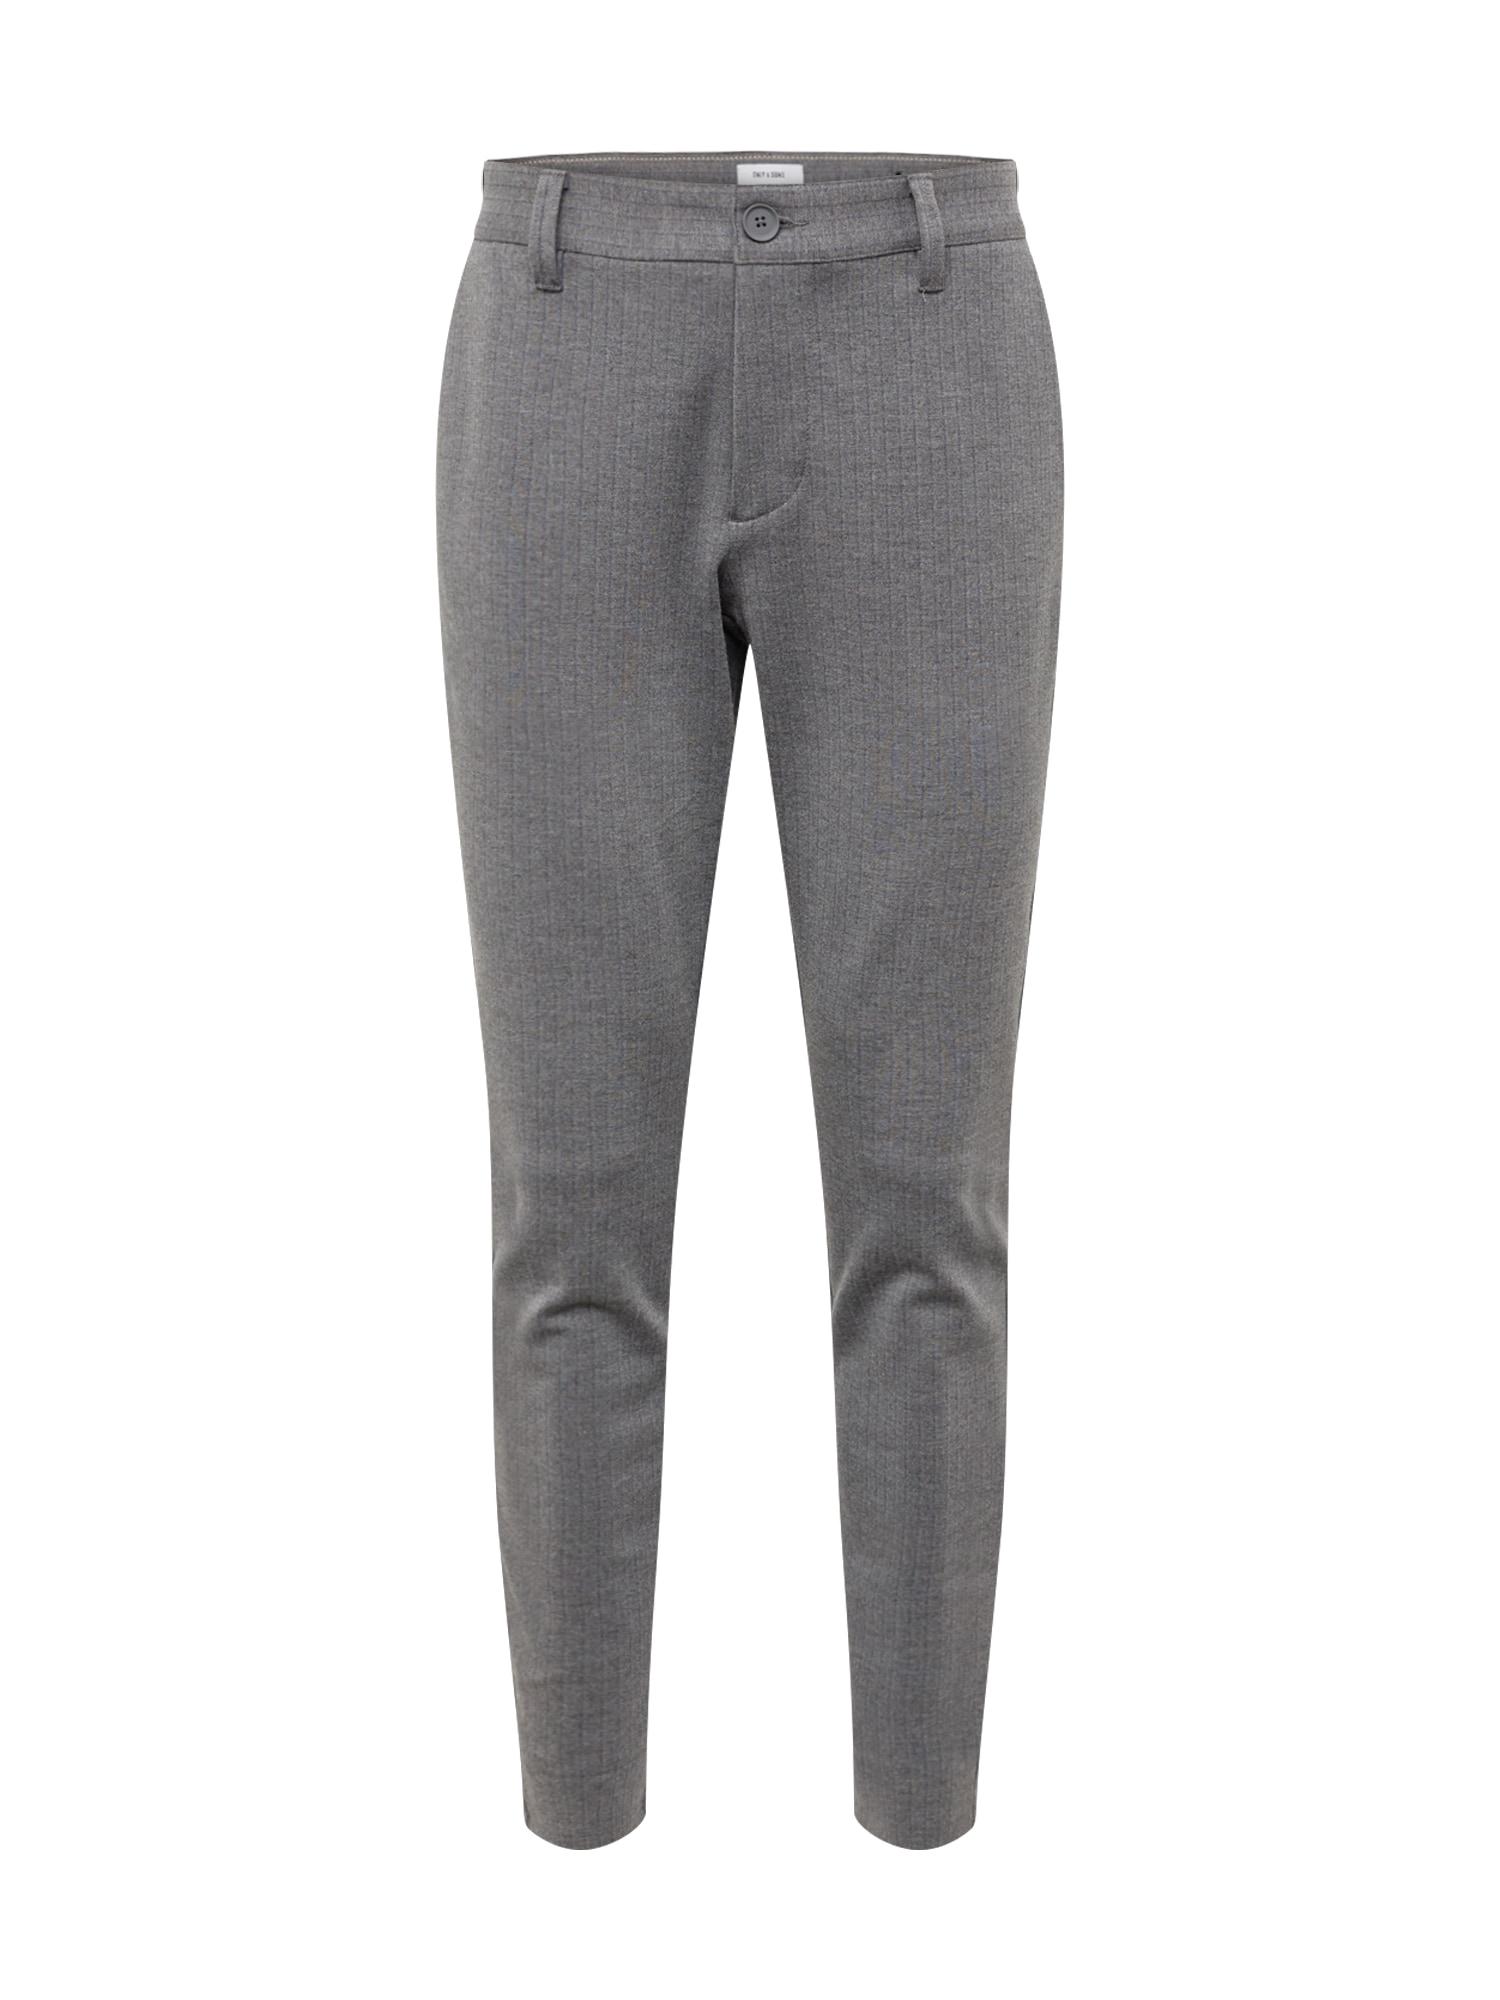 Chino kalhoty onsMARK PANT STRIPE GW 3727 NOOS šedá Only & Sons